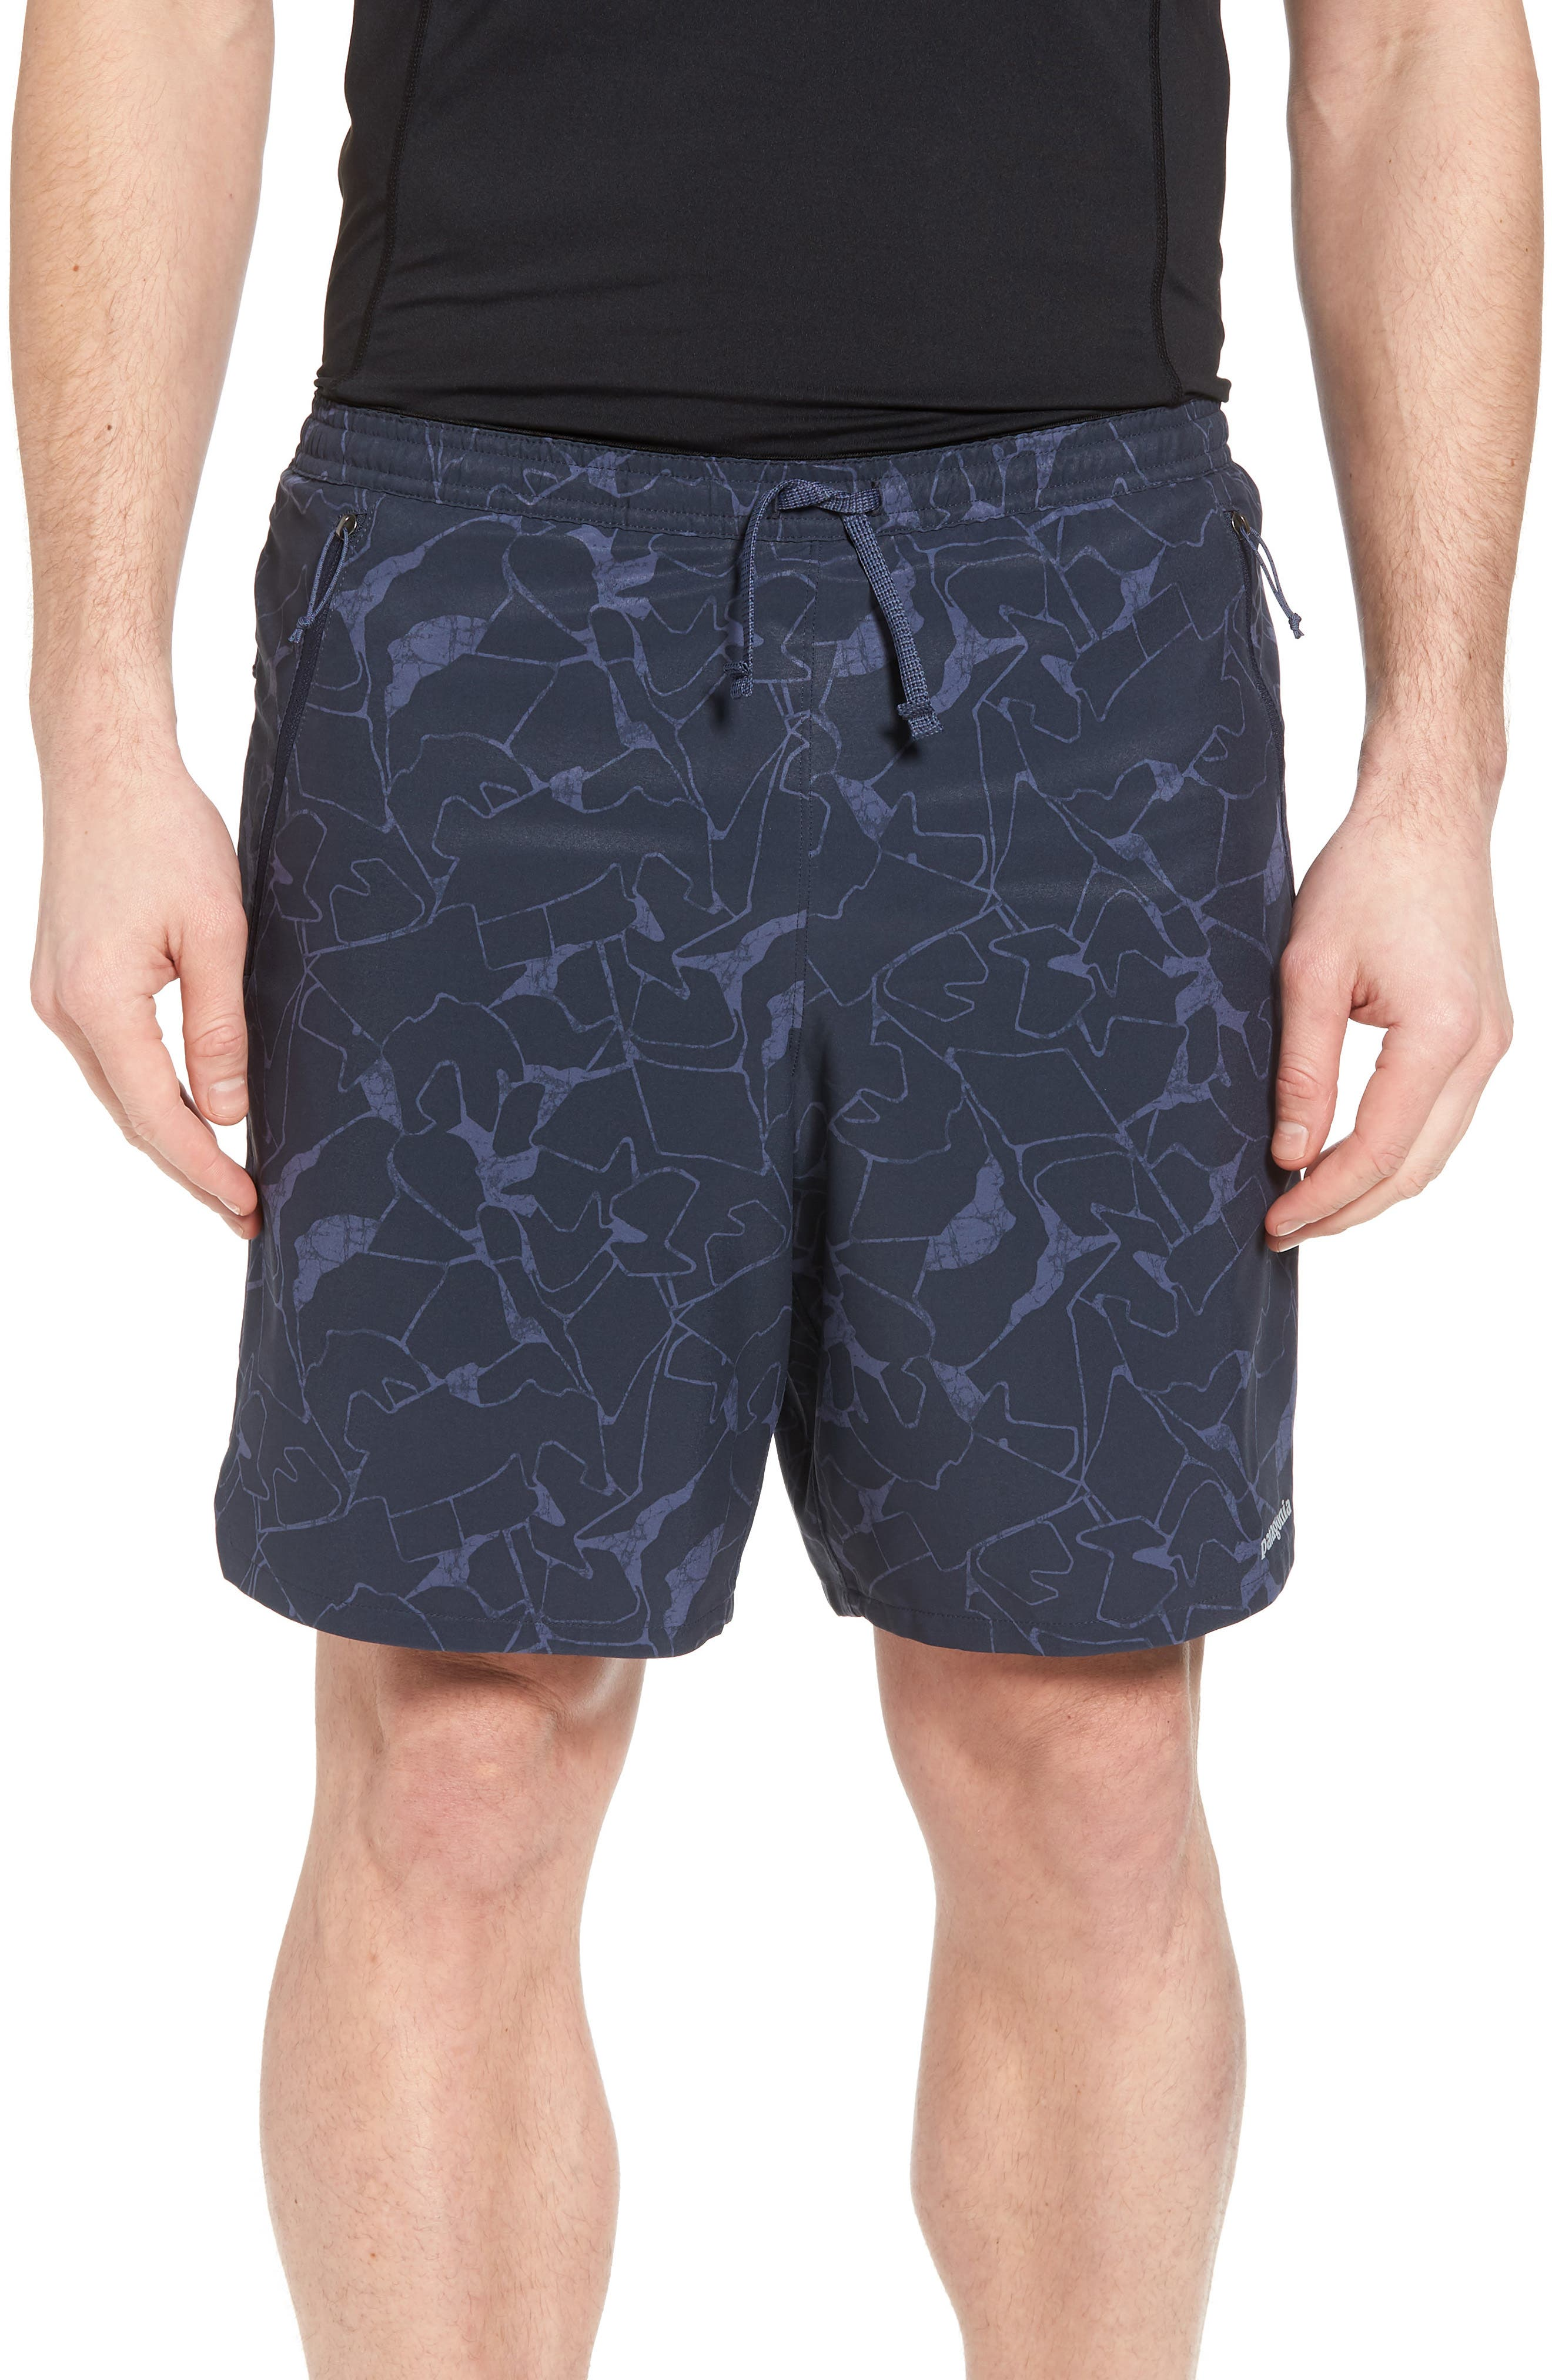 Nine Trails Hiking Shorts,                             Main thumbnail 1, color,                             Rock Jigsaw/ Smolder Blue